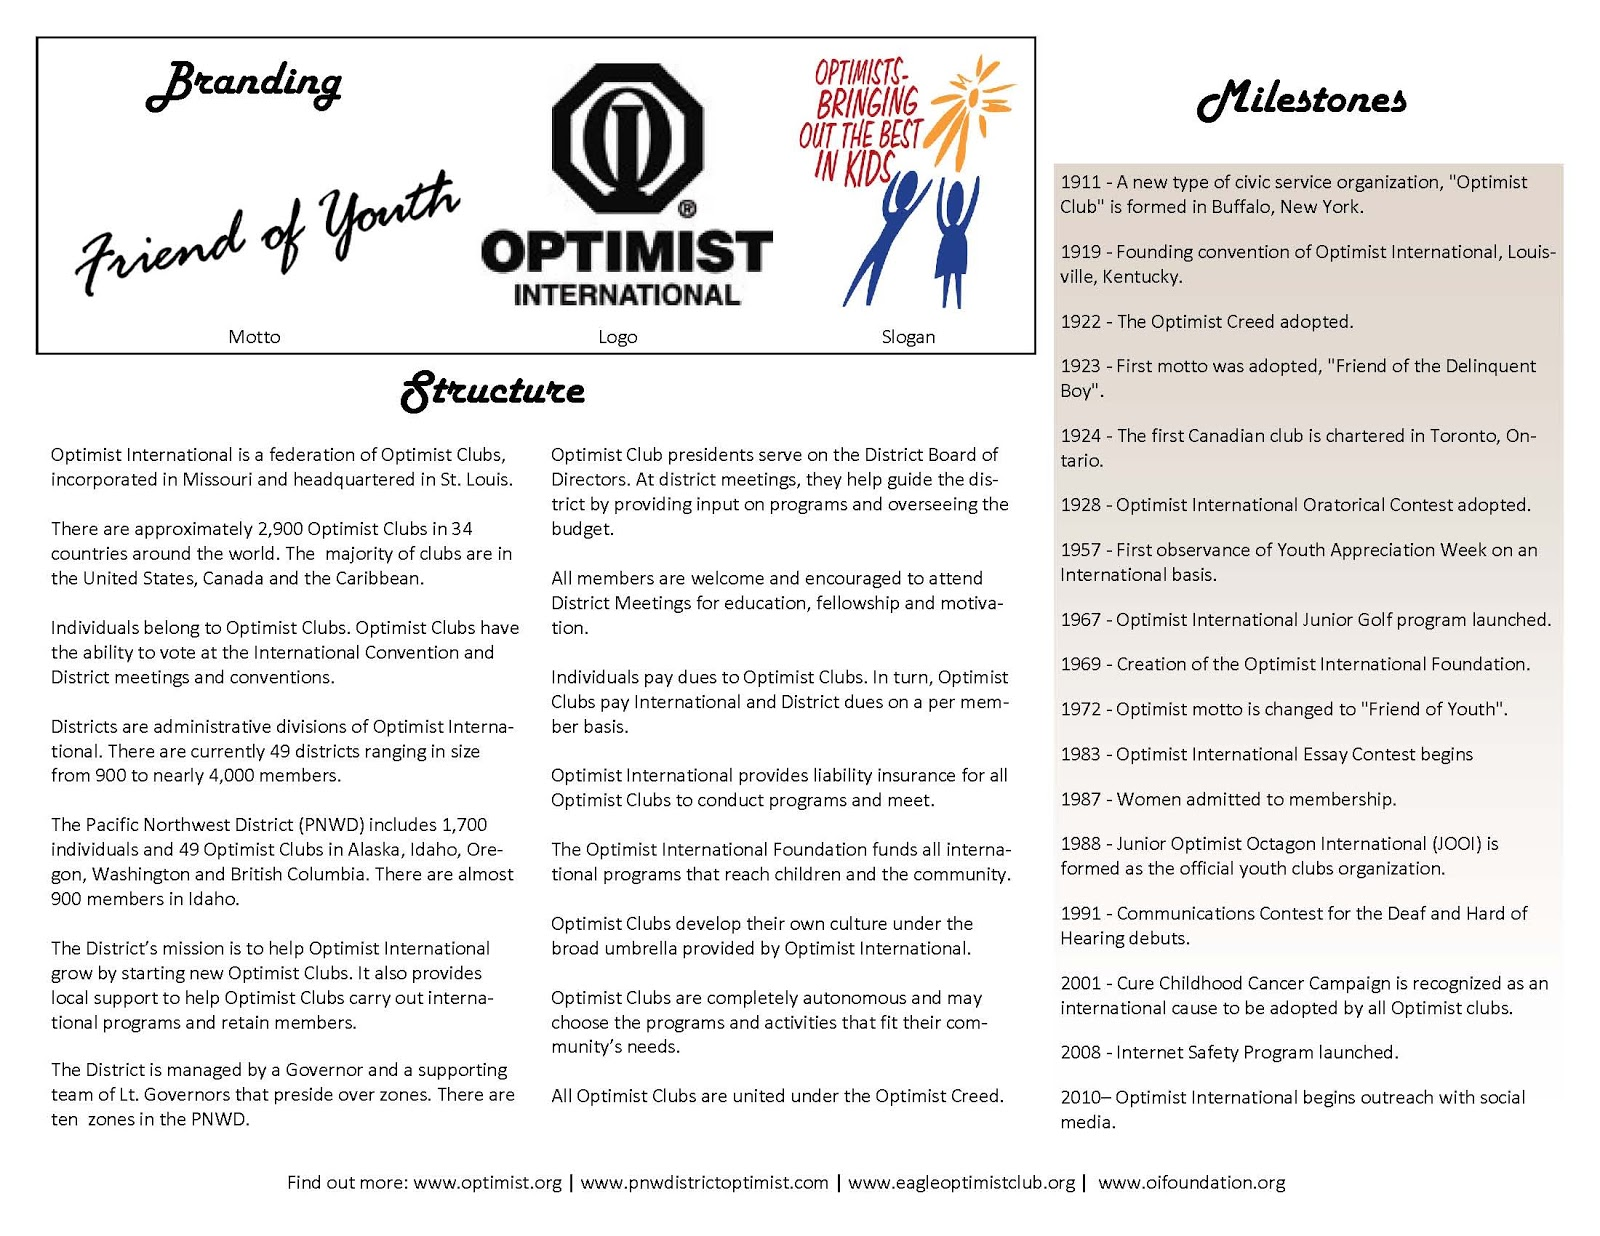 020 Essay Example Orientation Optimist International Wondrous Contest Winners Due Date Oratorical Full